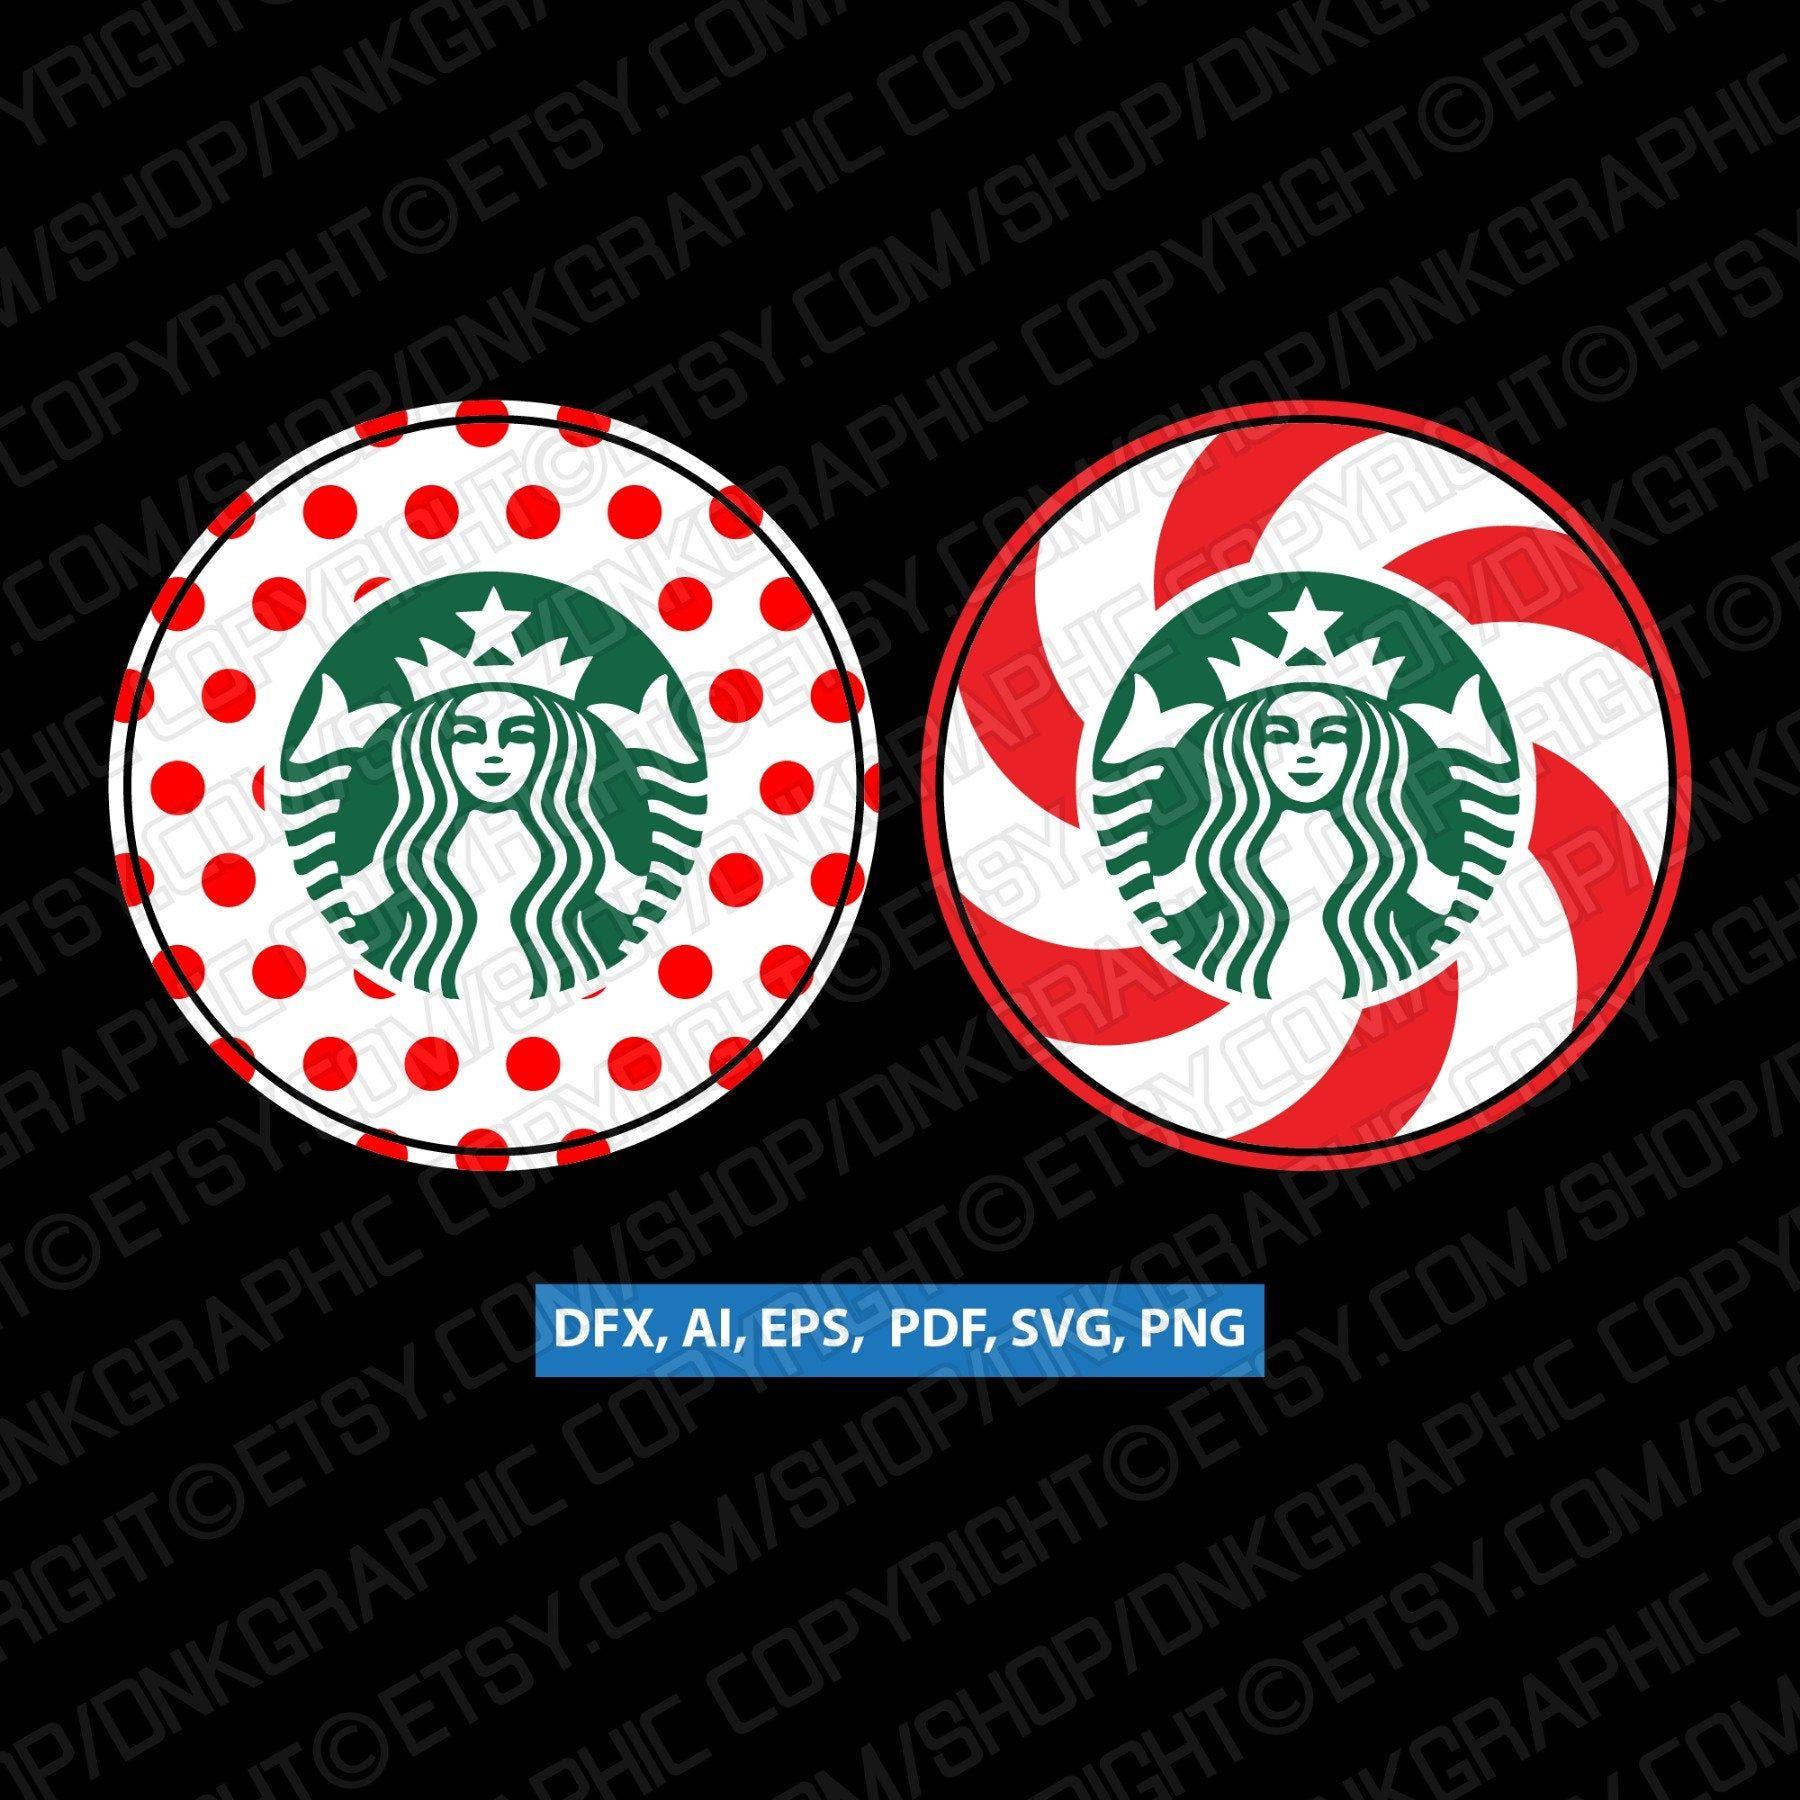 Polkadot Candy Cane Starbucks Cup SVG Tumbler Mug Cold Cup